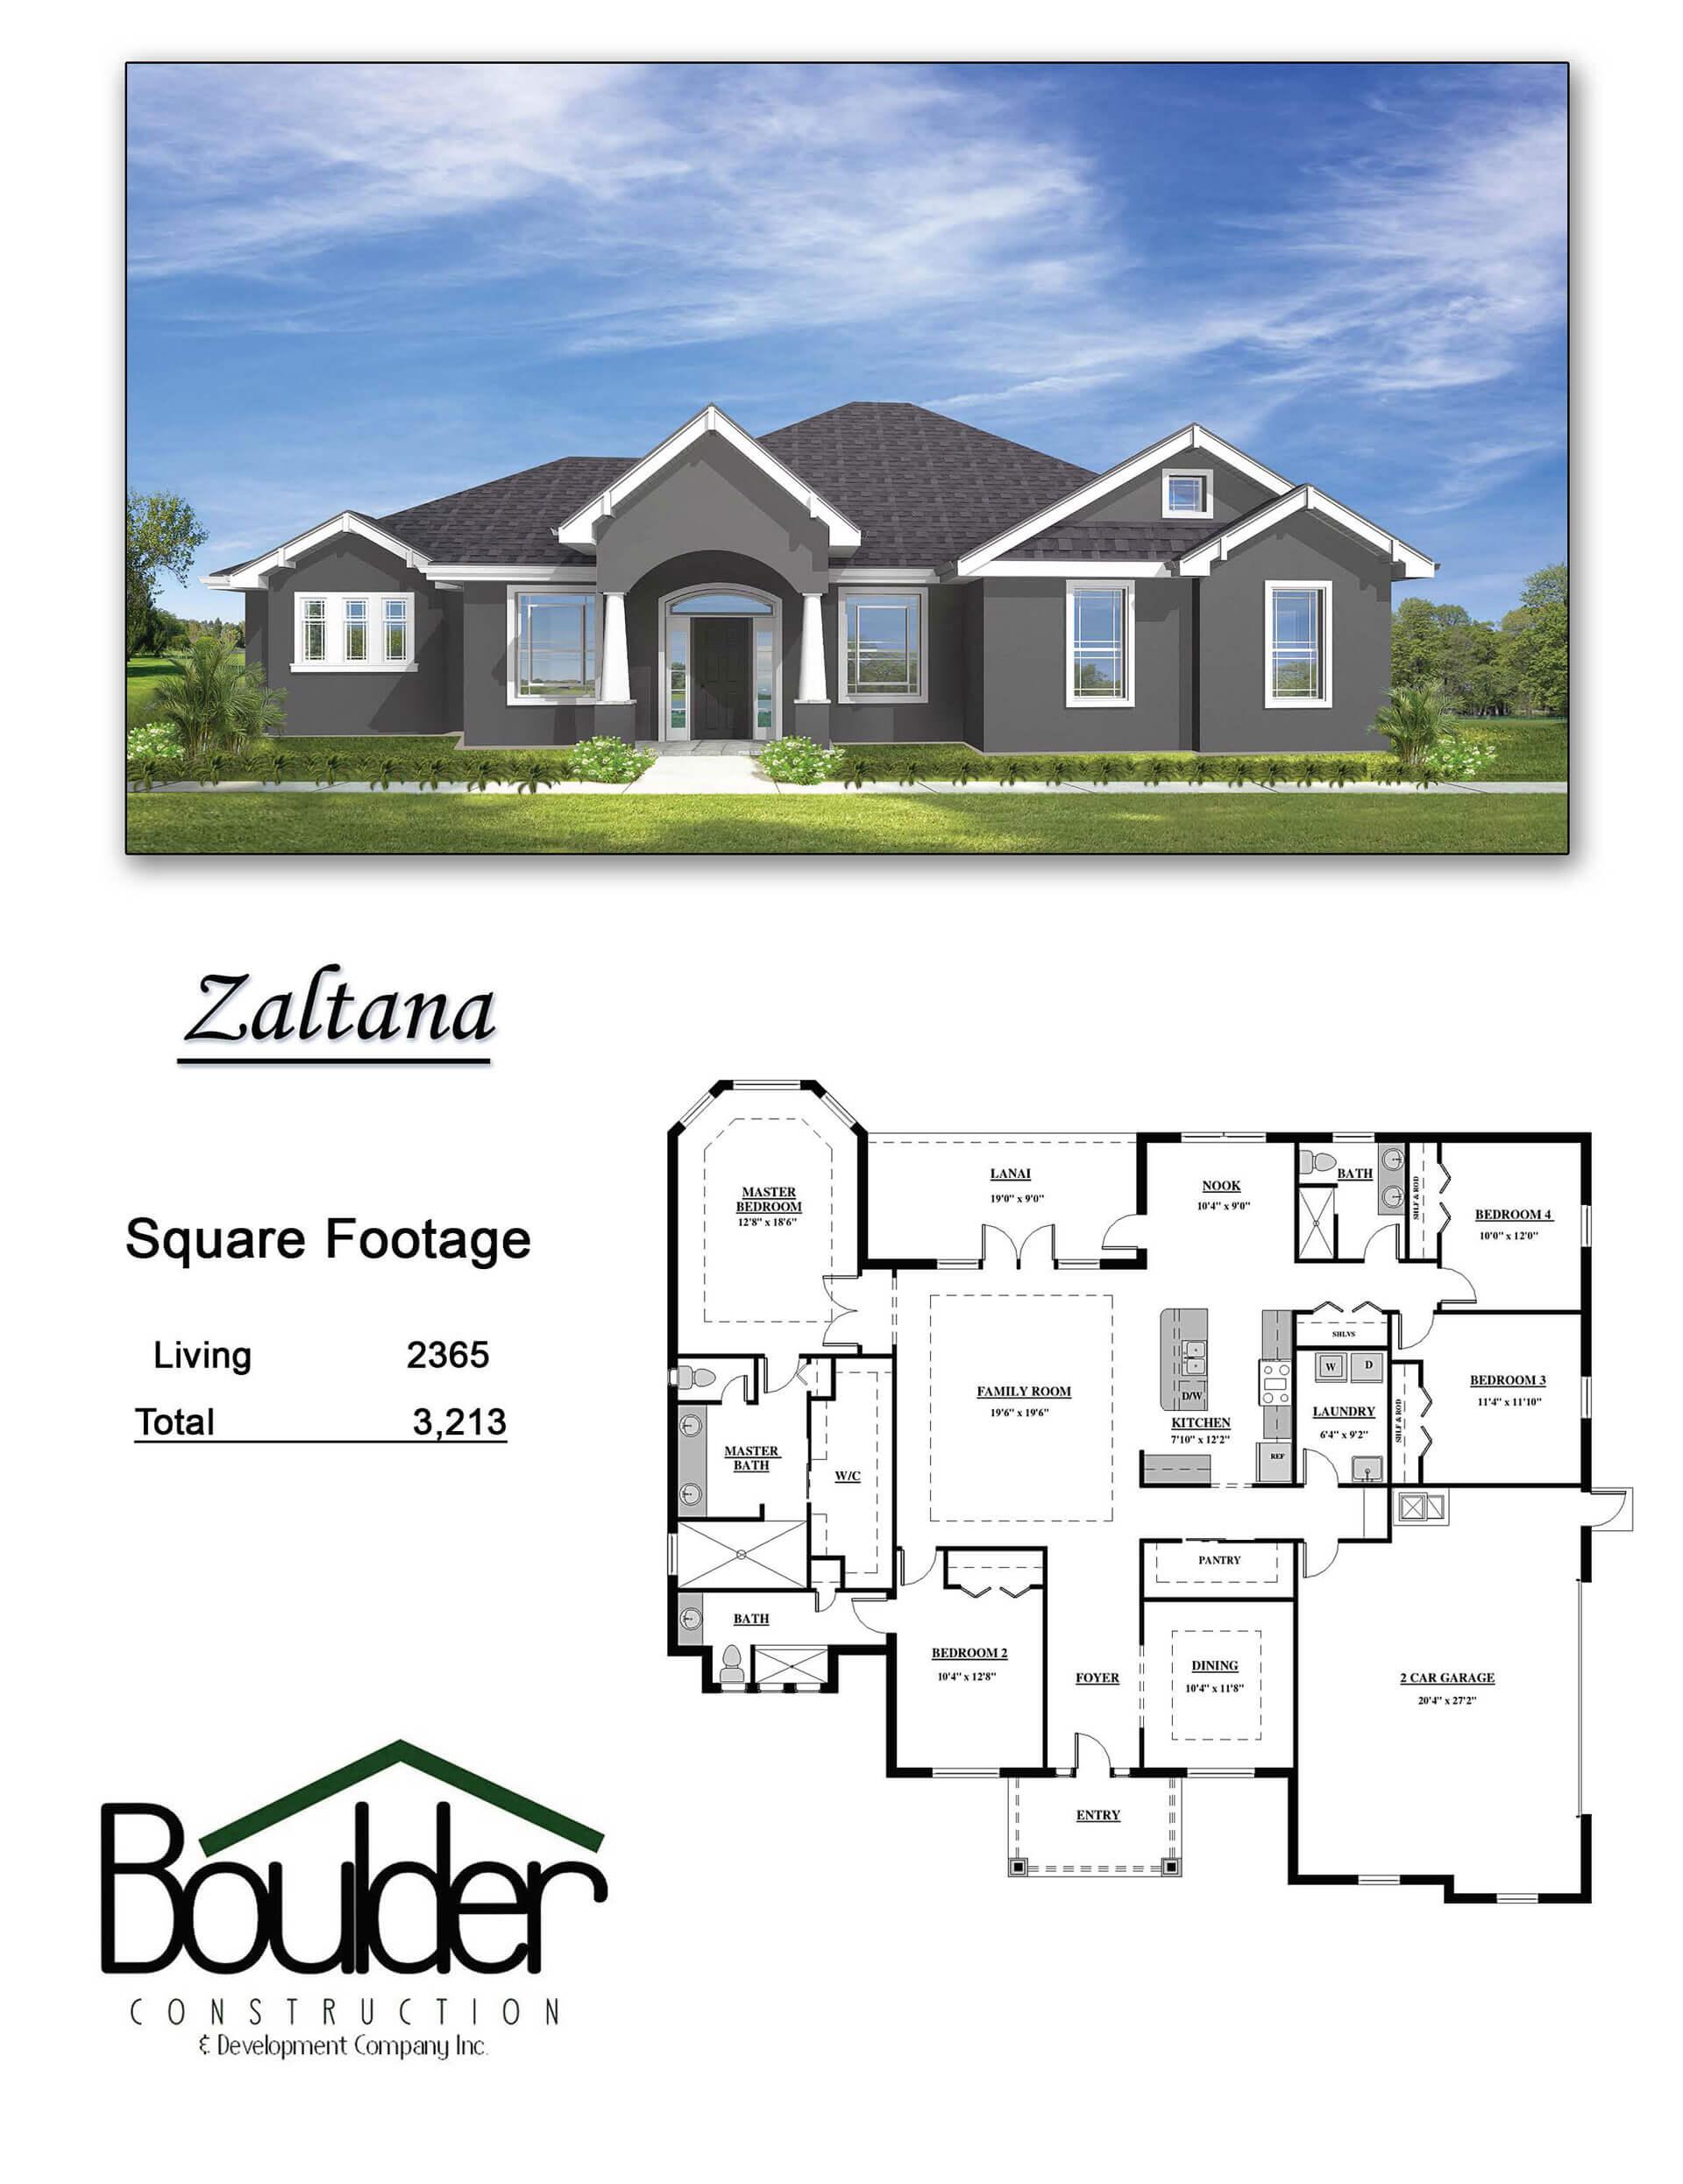 boulder-construction-zaltana-floor-plan